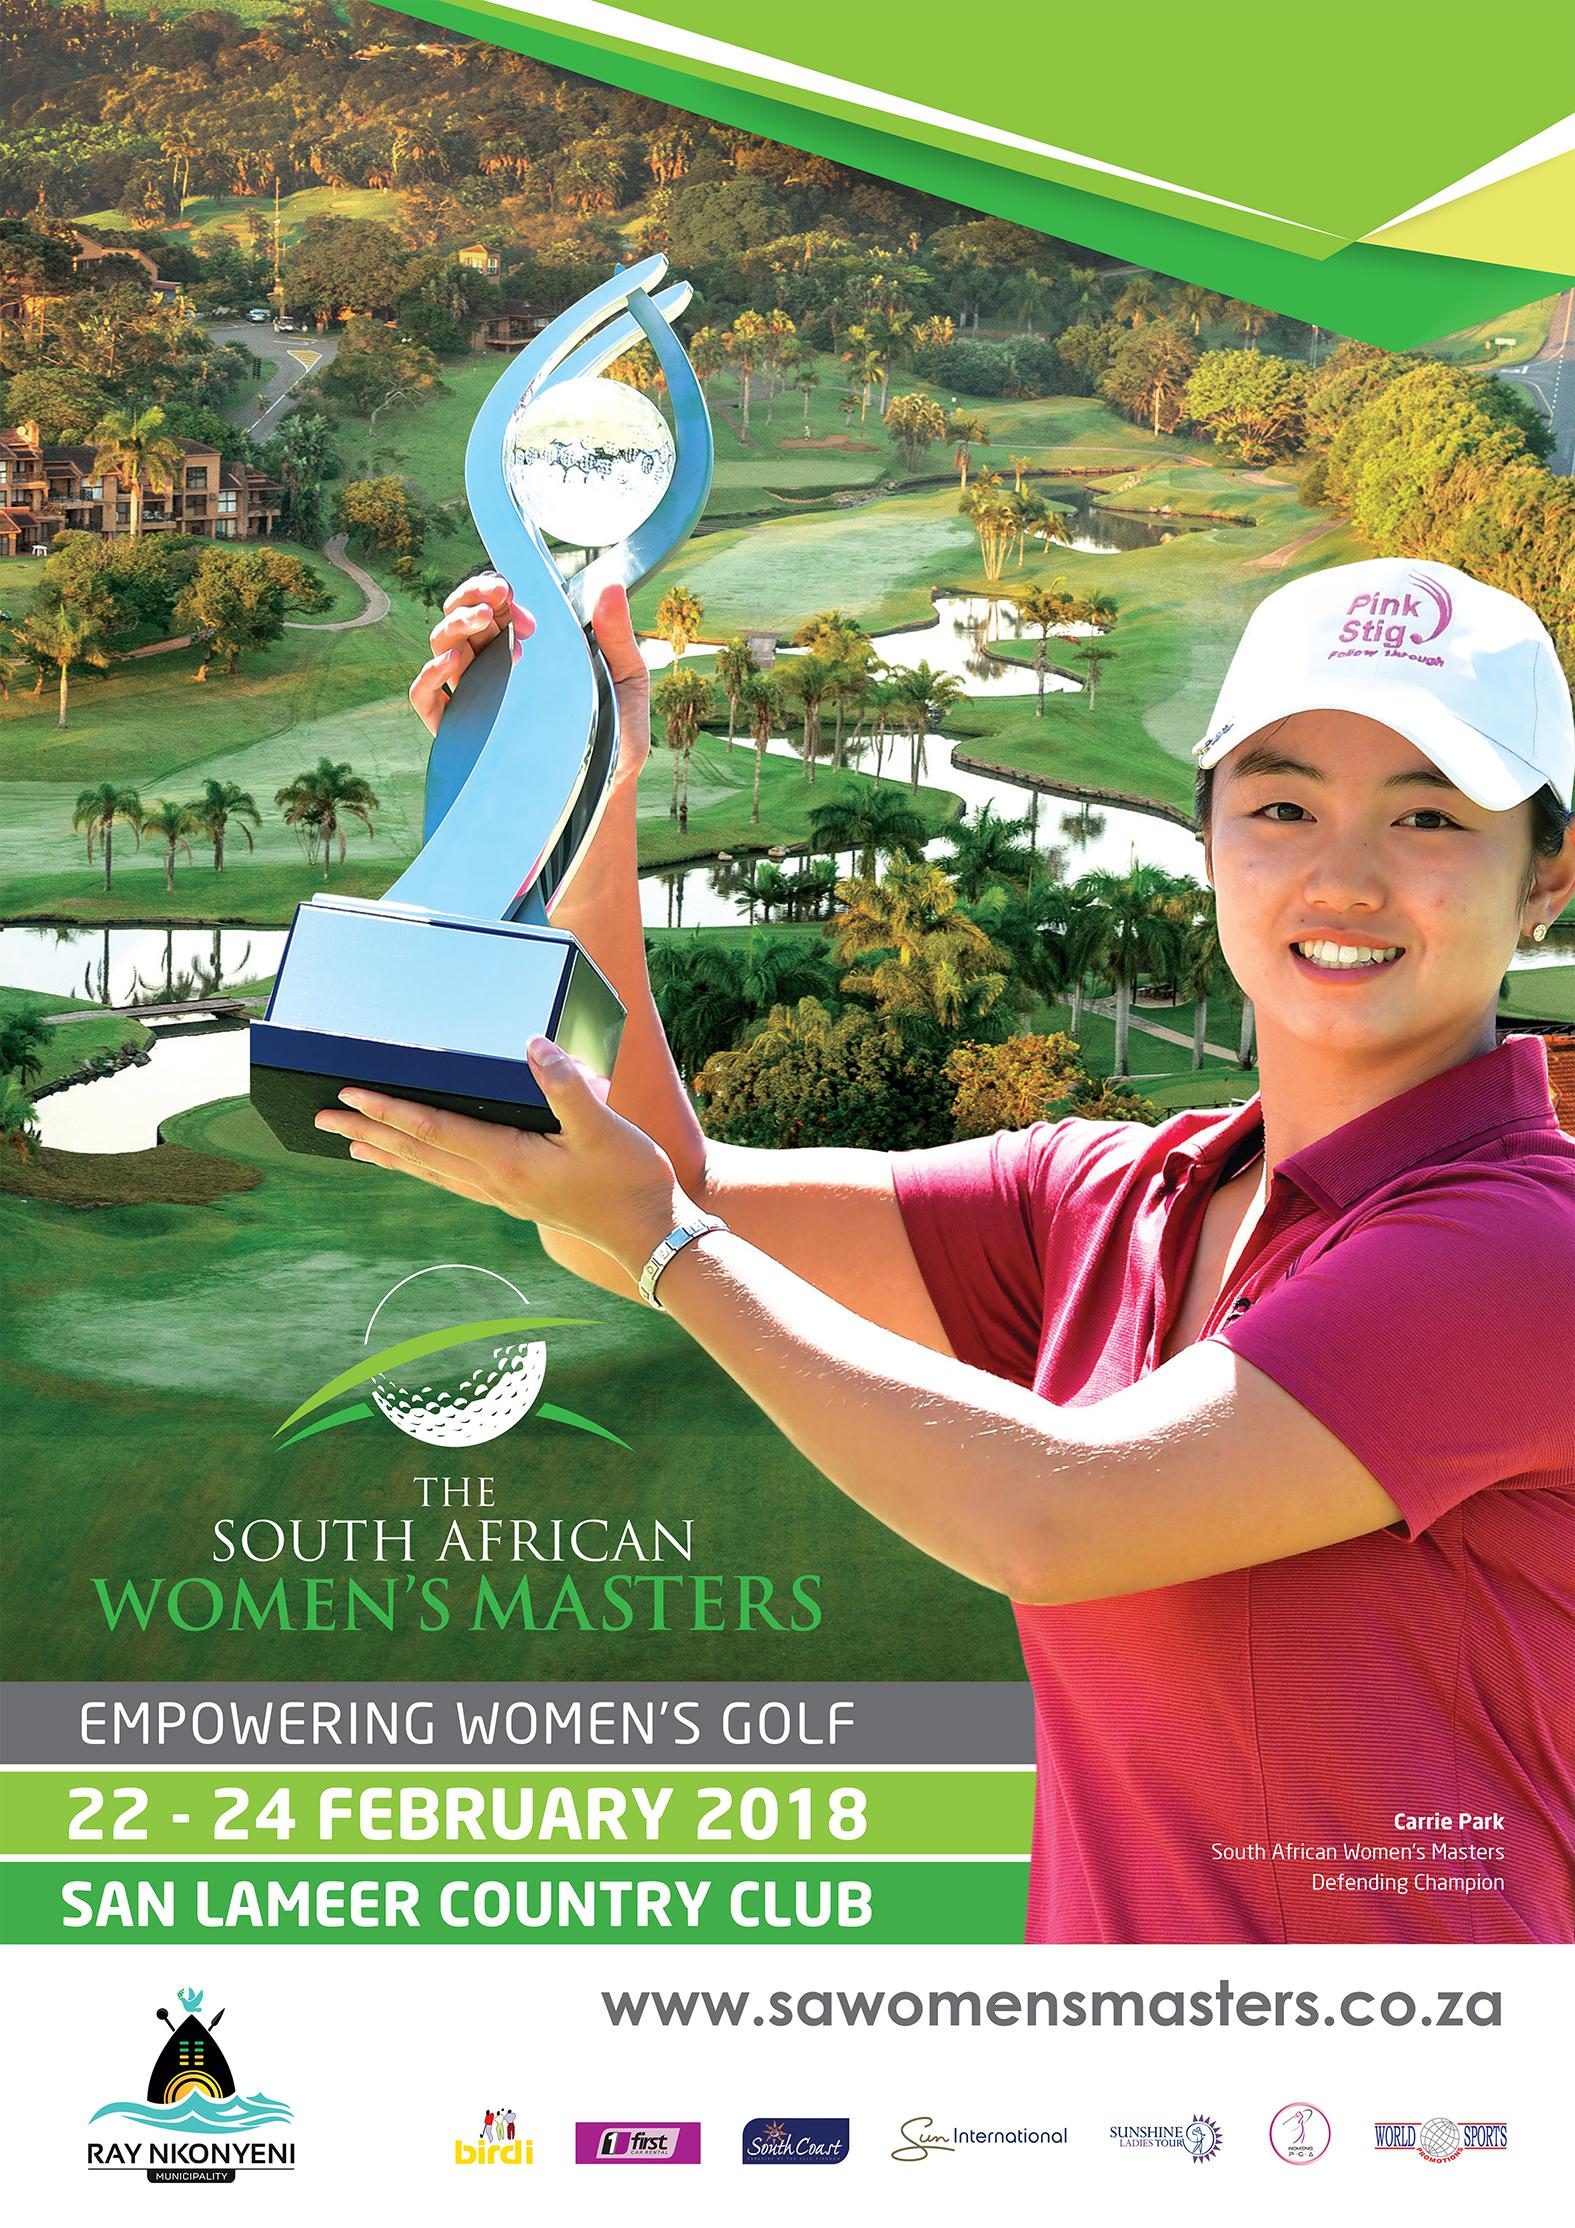 SA Women's Masters - San Lameer